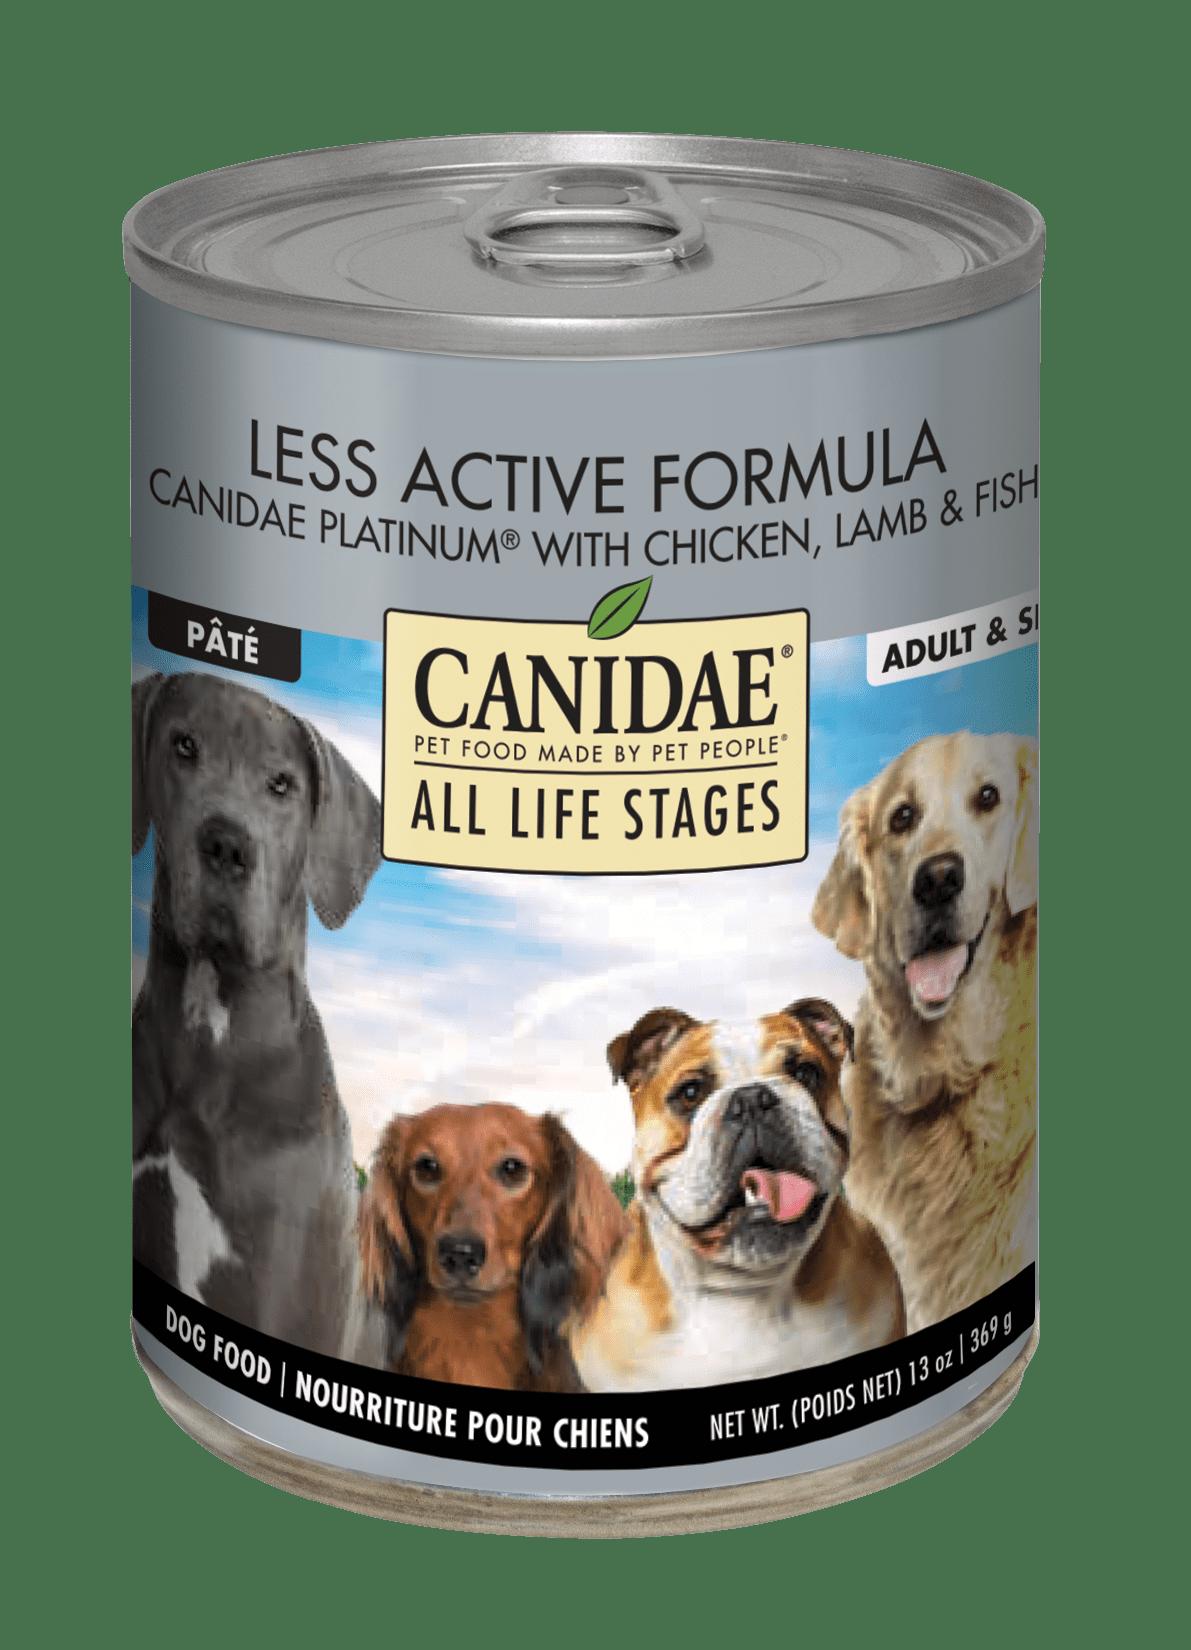 Canidae Life Stages Platinum Formula Canned Dog Food, 13-oz